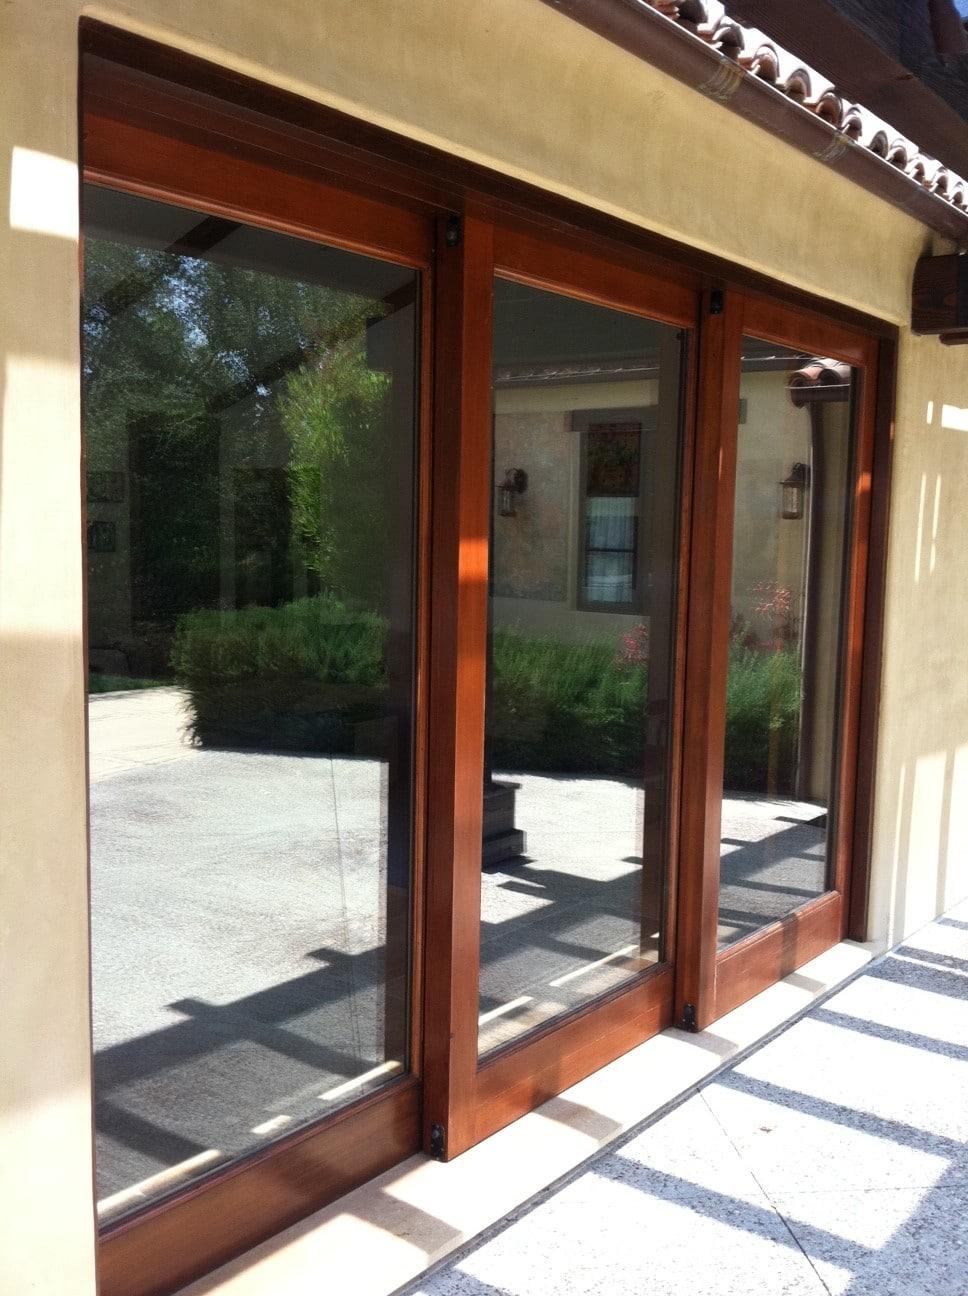 Puertas correderas de exterior 35 modelos para tu hogar - Puerta corredera exterior ...